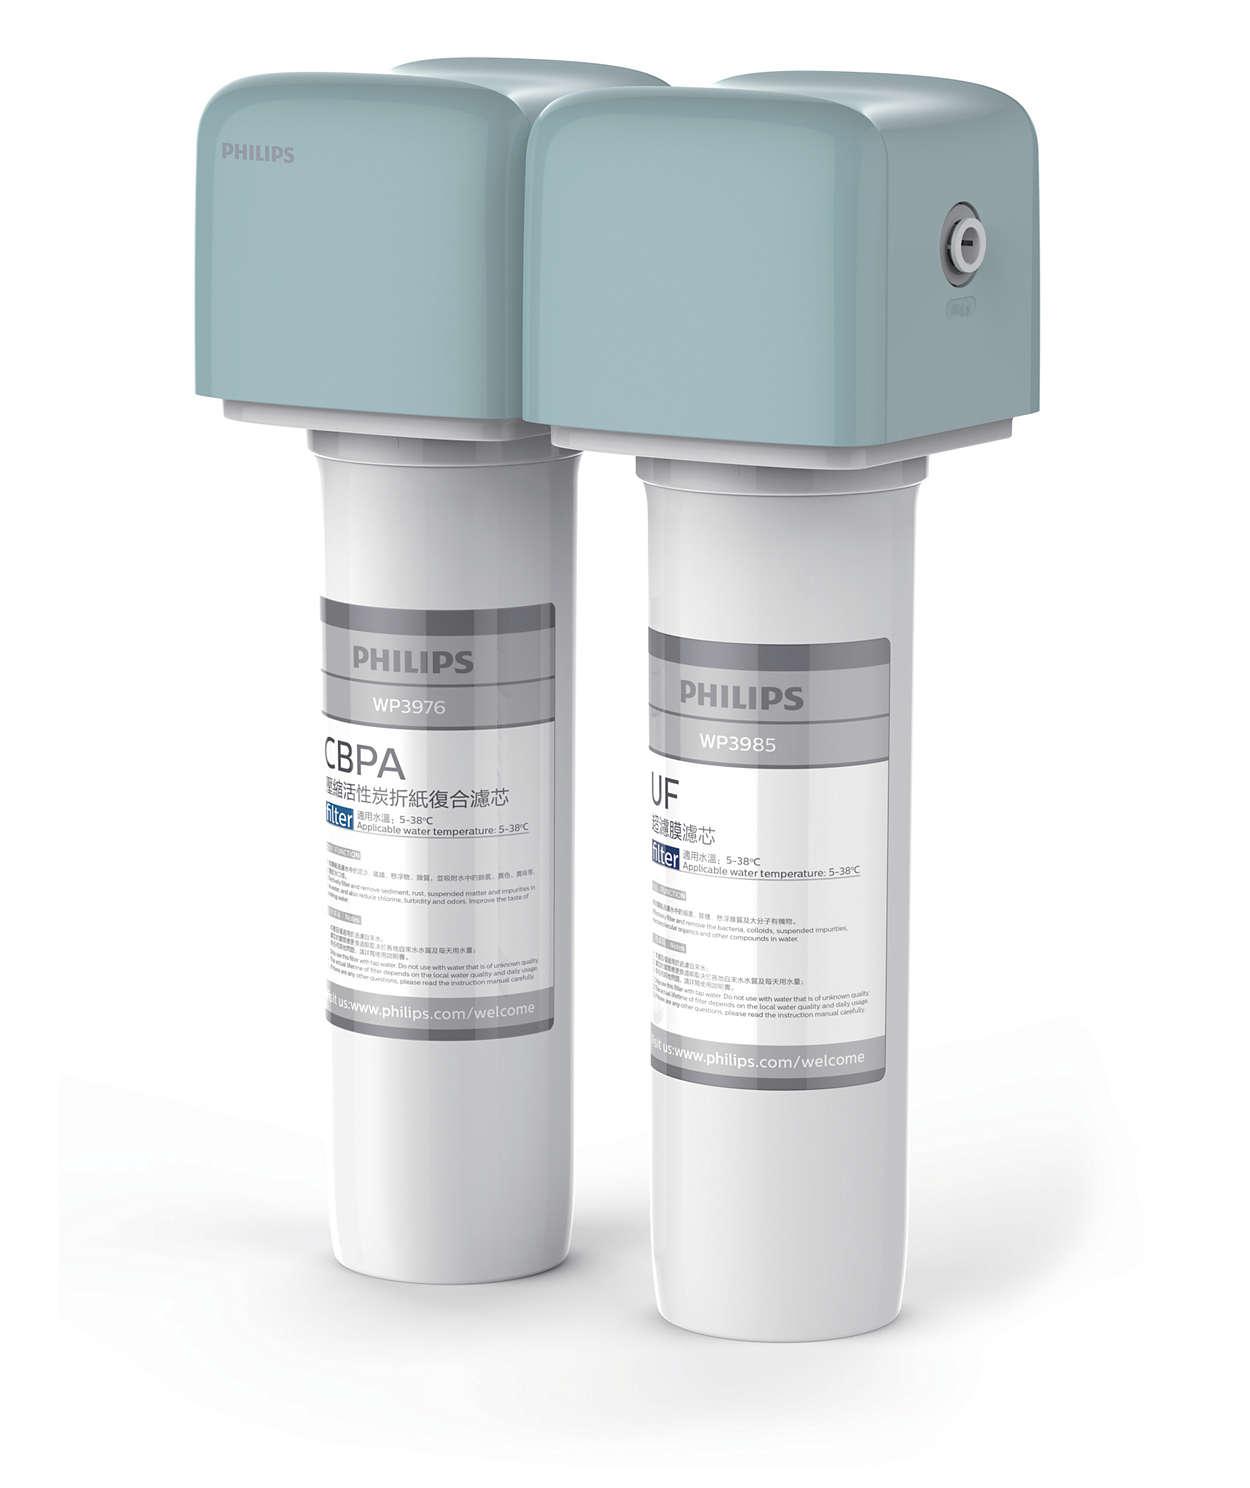 Philips 飛利浦 AquaShield WP4141 家用高效超濾廚下式濾水器 配原裝飲水龍頭 送安裝(價值$480)